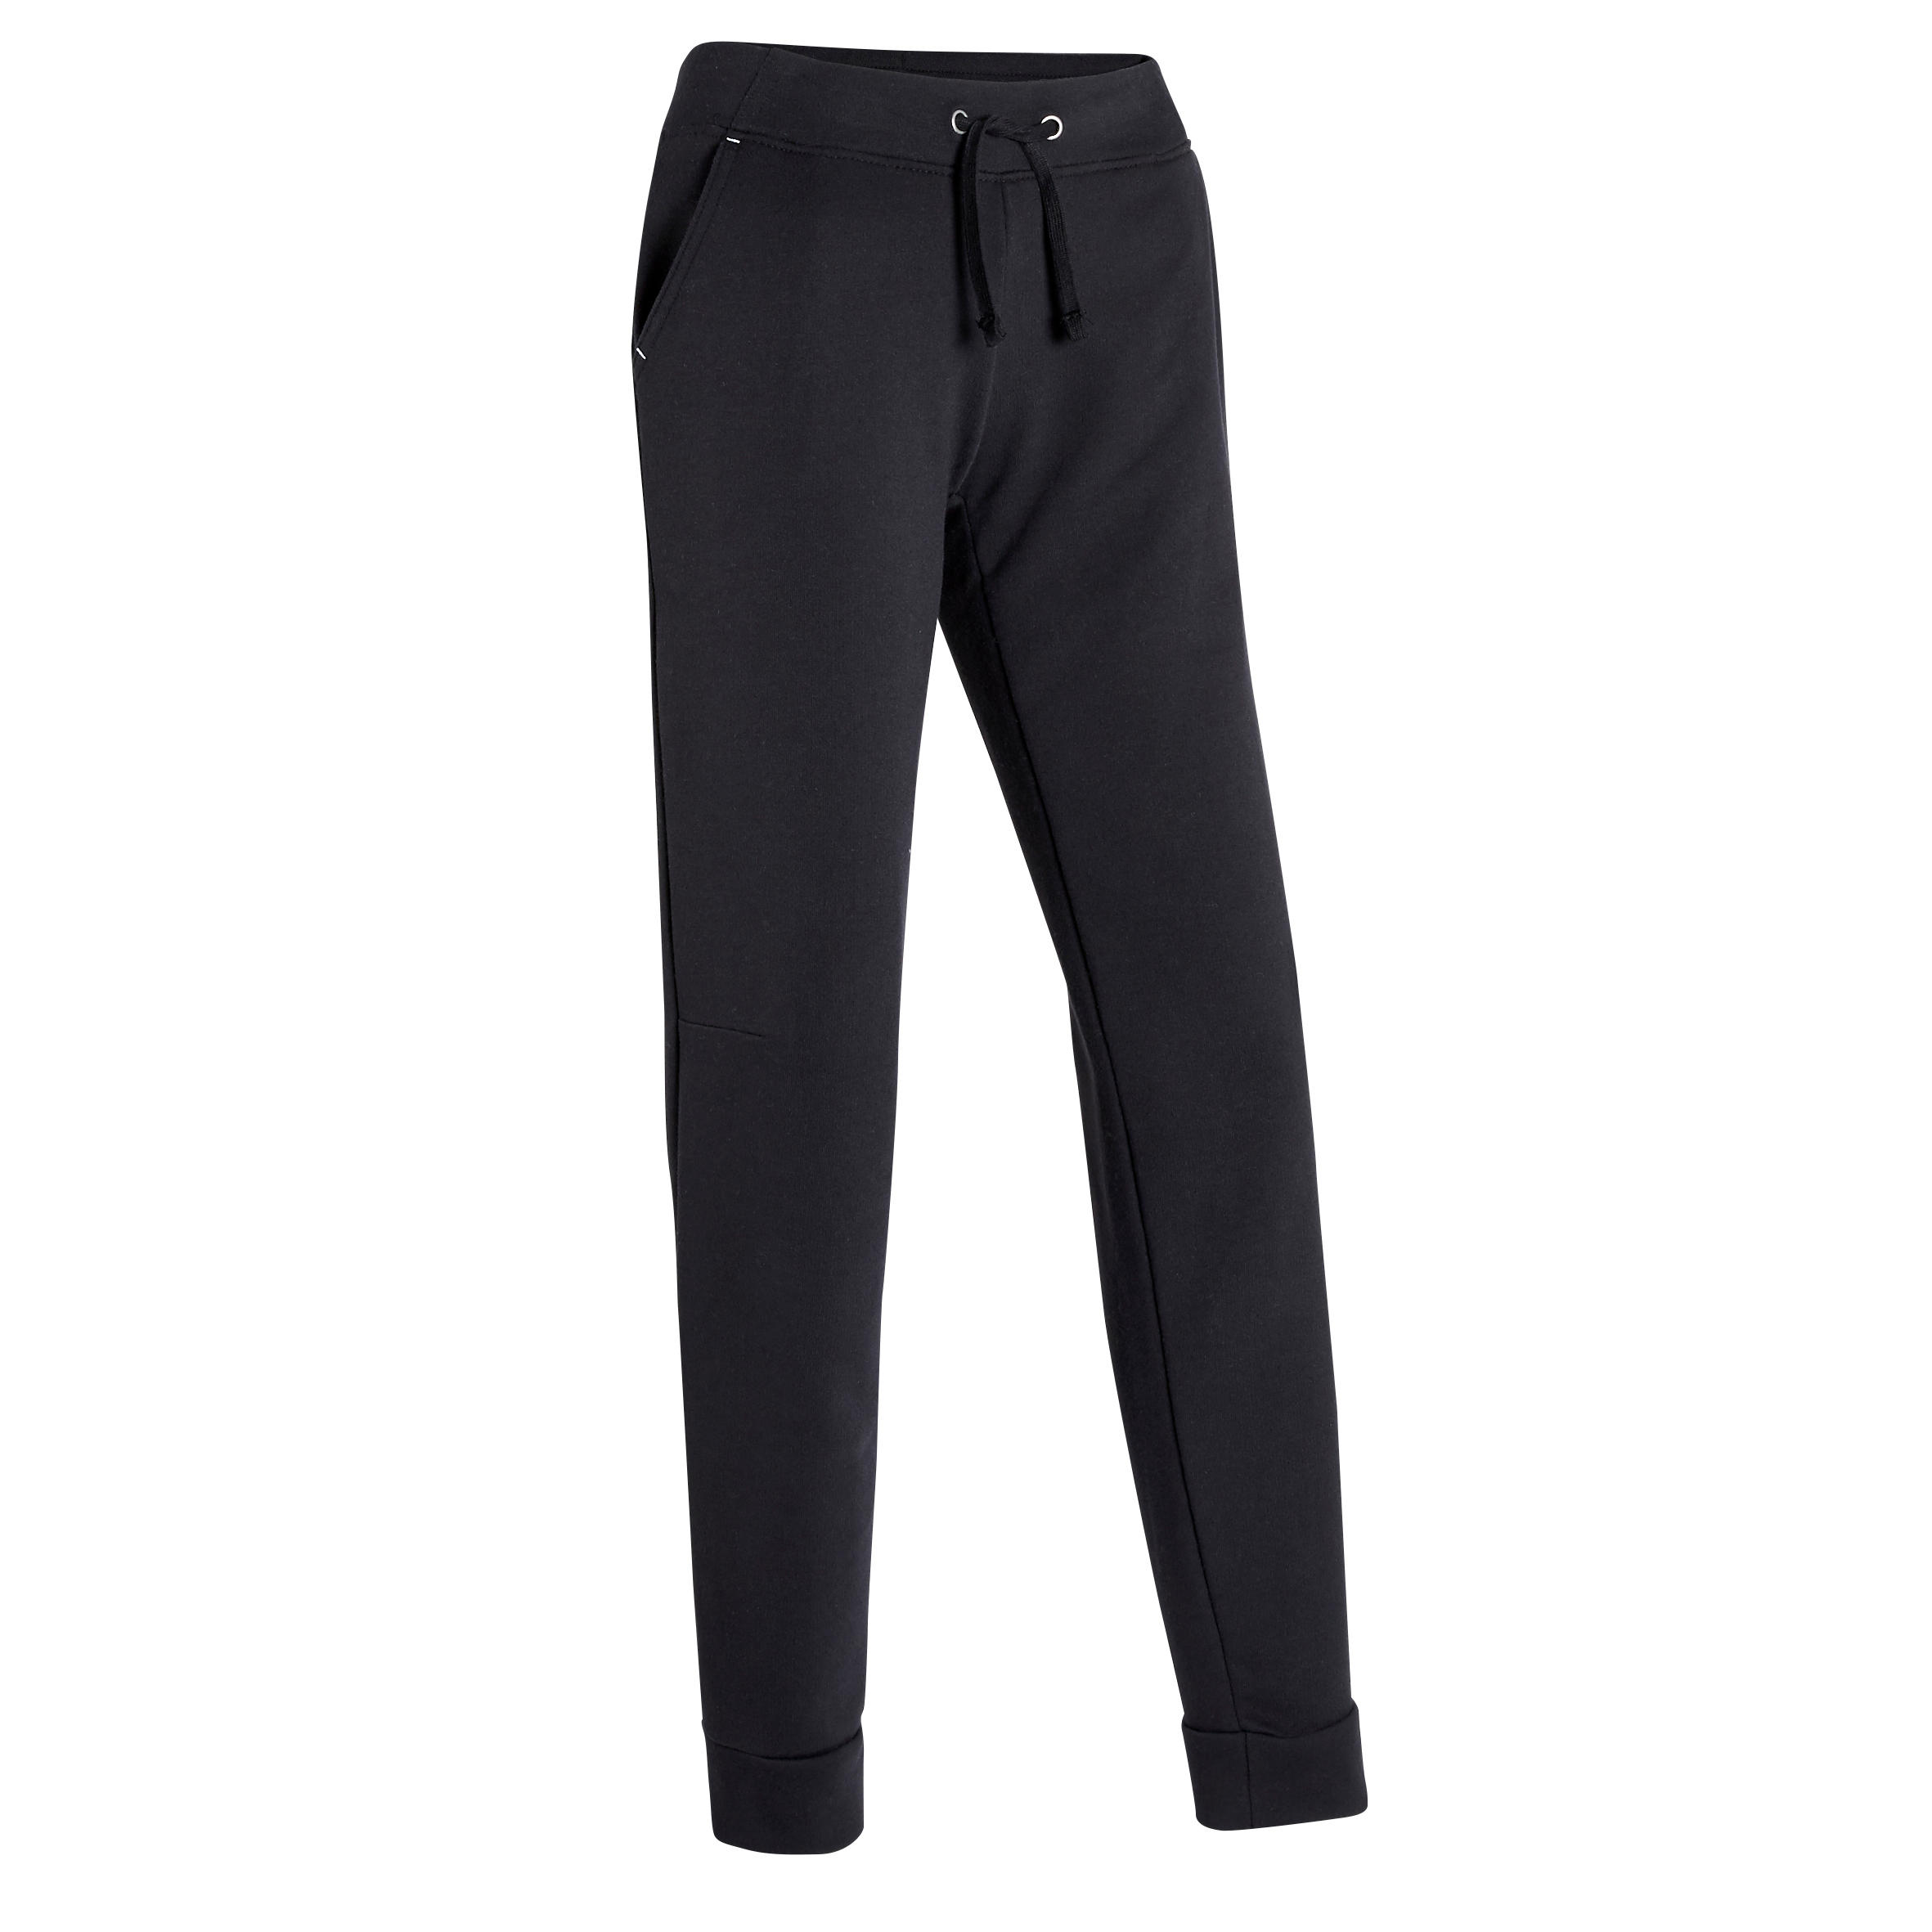 Pantalon regular 500 Damă la Reducere poza